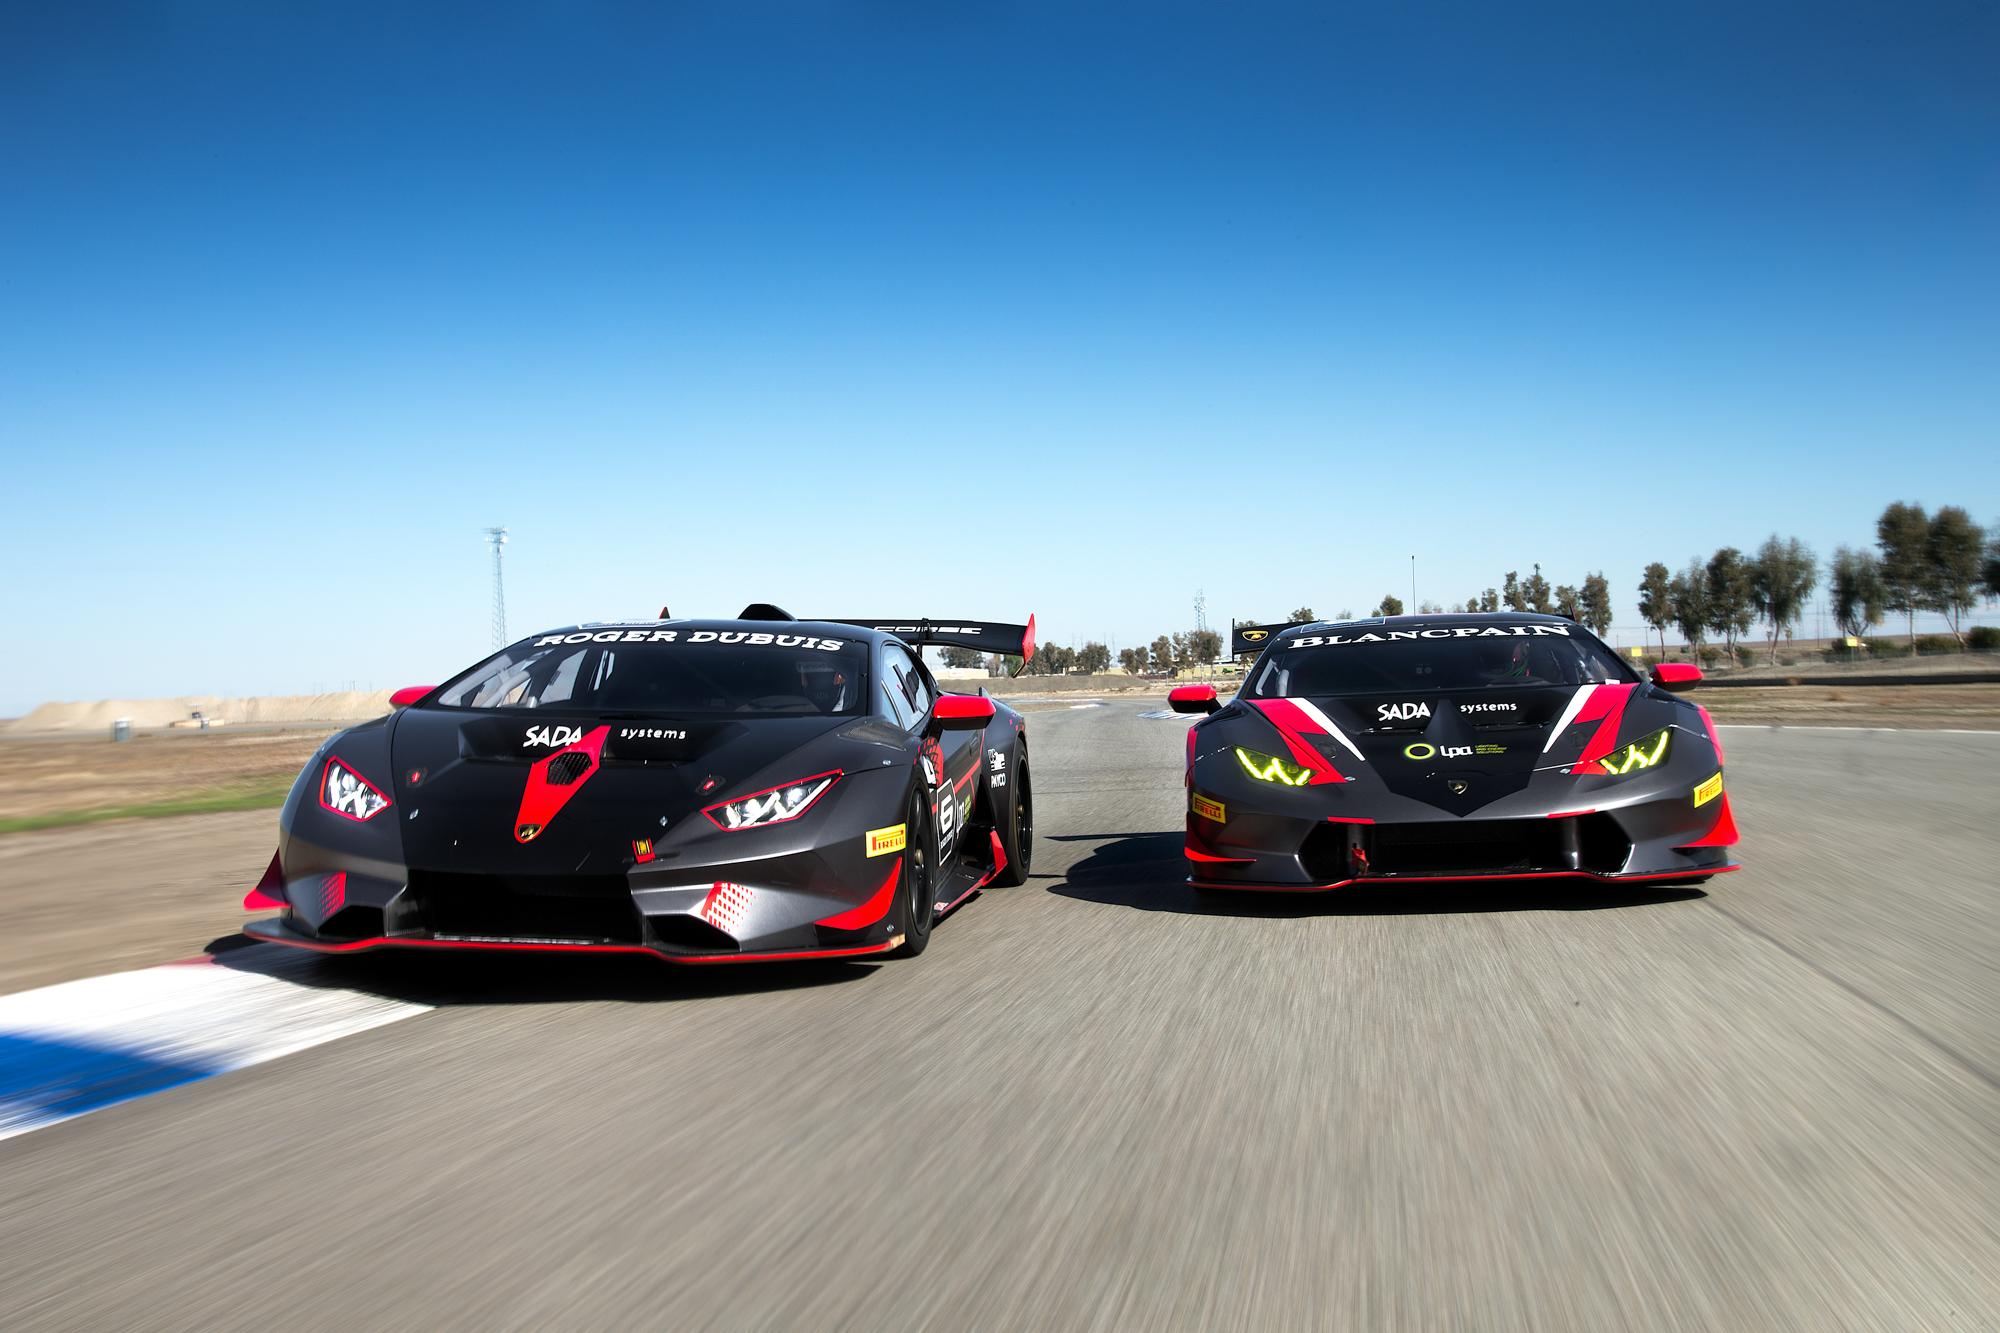 Steven-Racing-20180221-73189.jpg